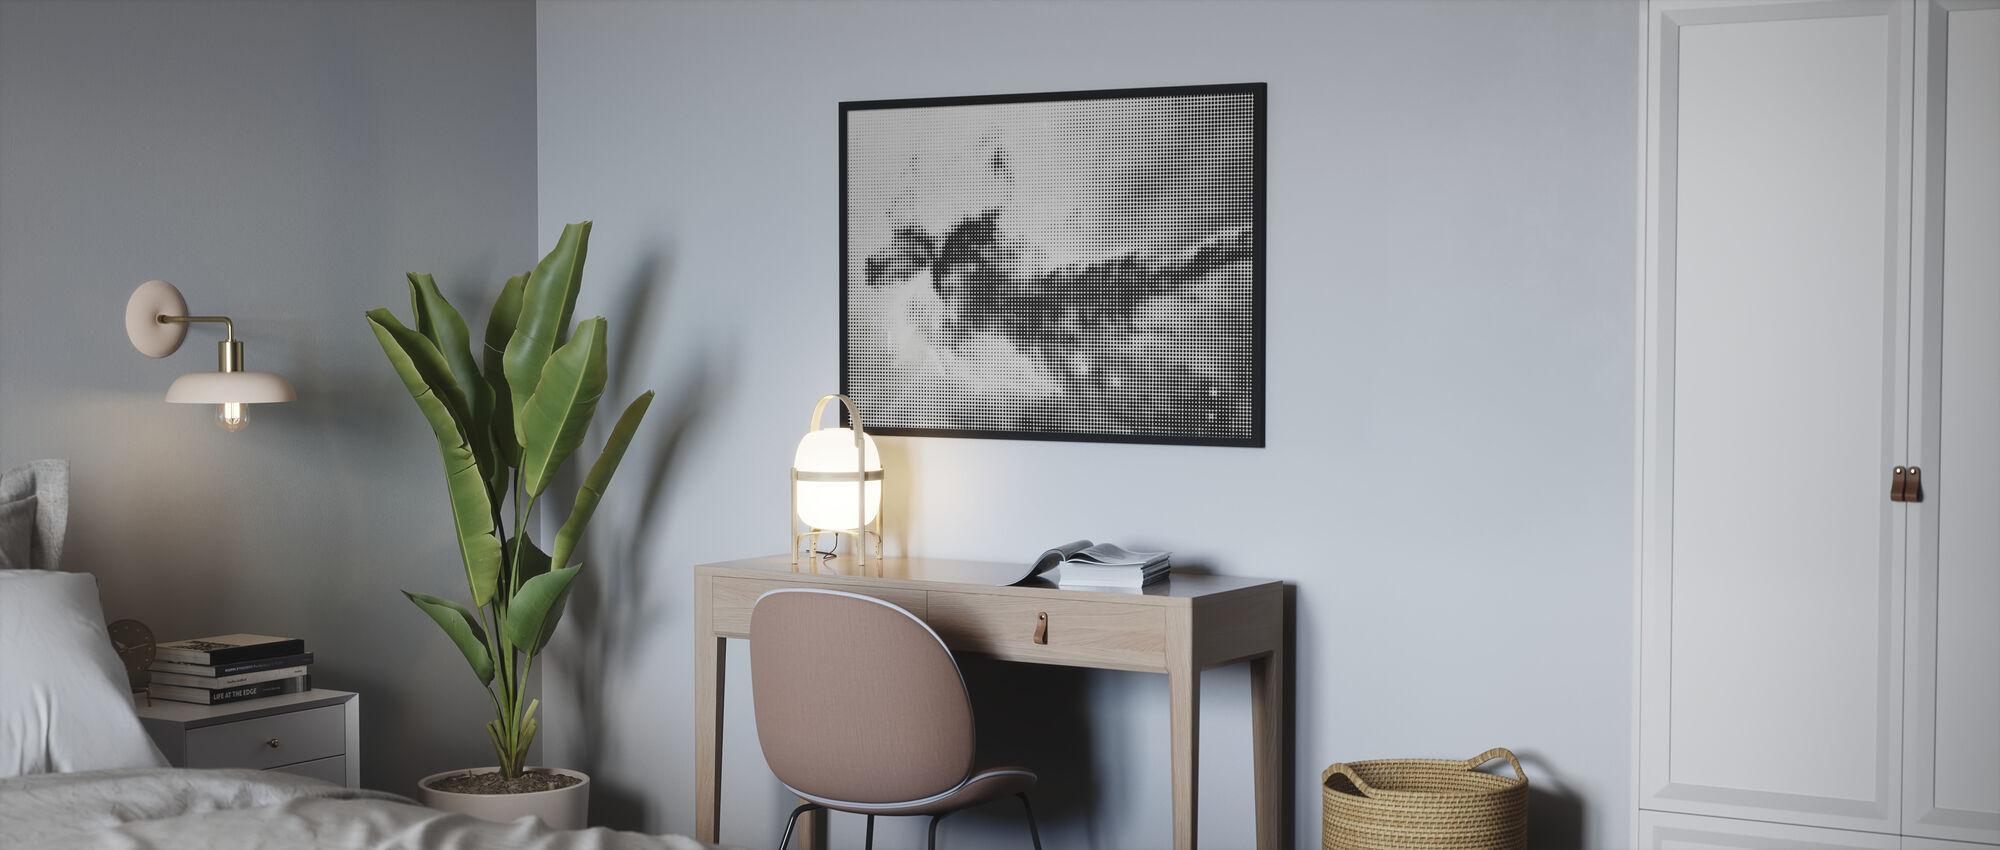 Final Frontier Galaxy One - Poster - Bedroom